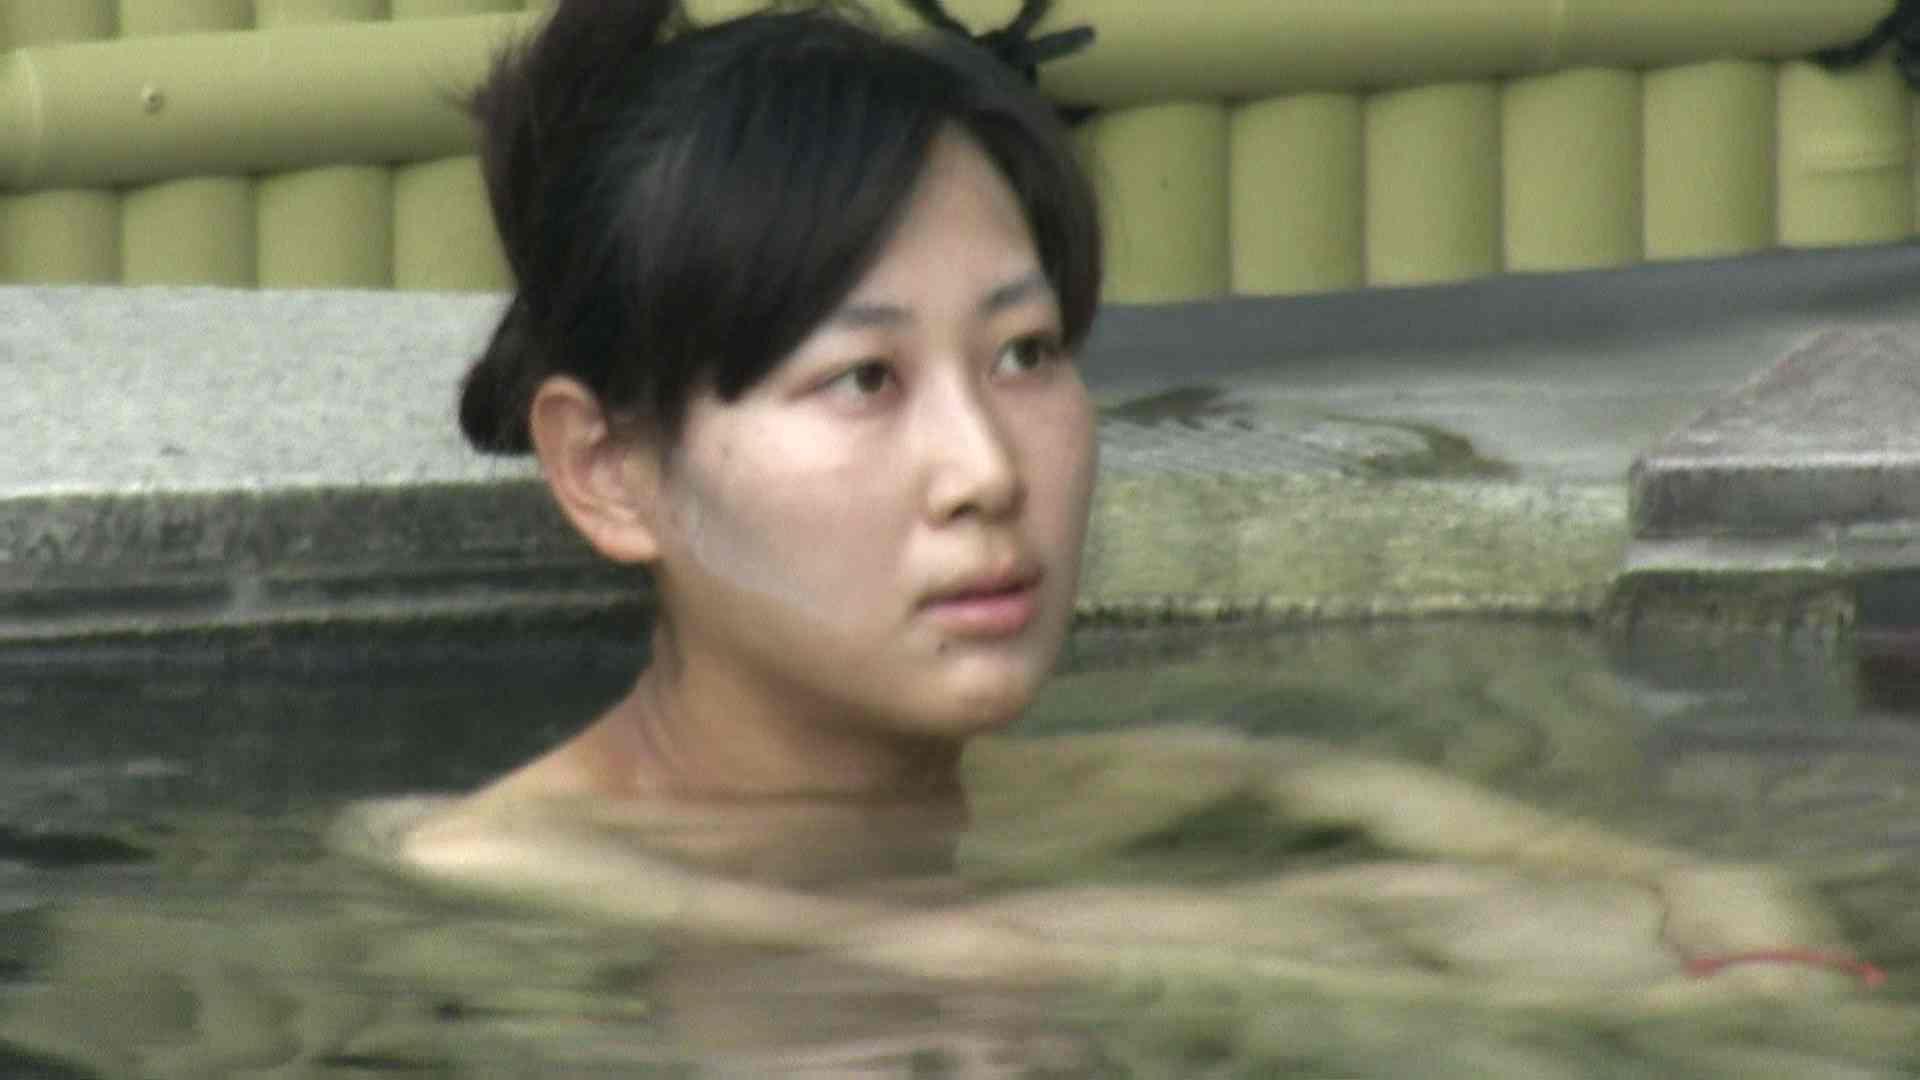 Aquaな露天風呂Vol.665 綺麗なOLたち  85枚 36